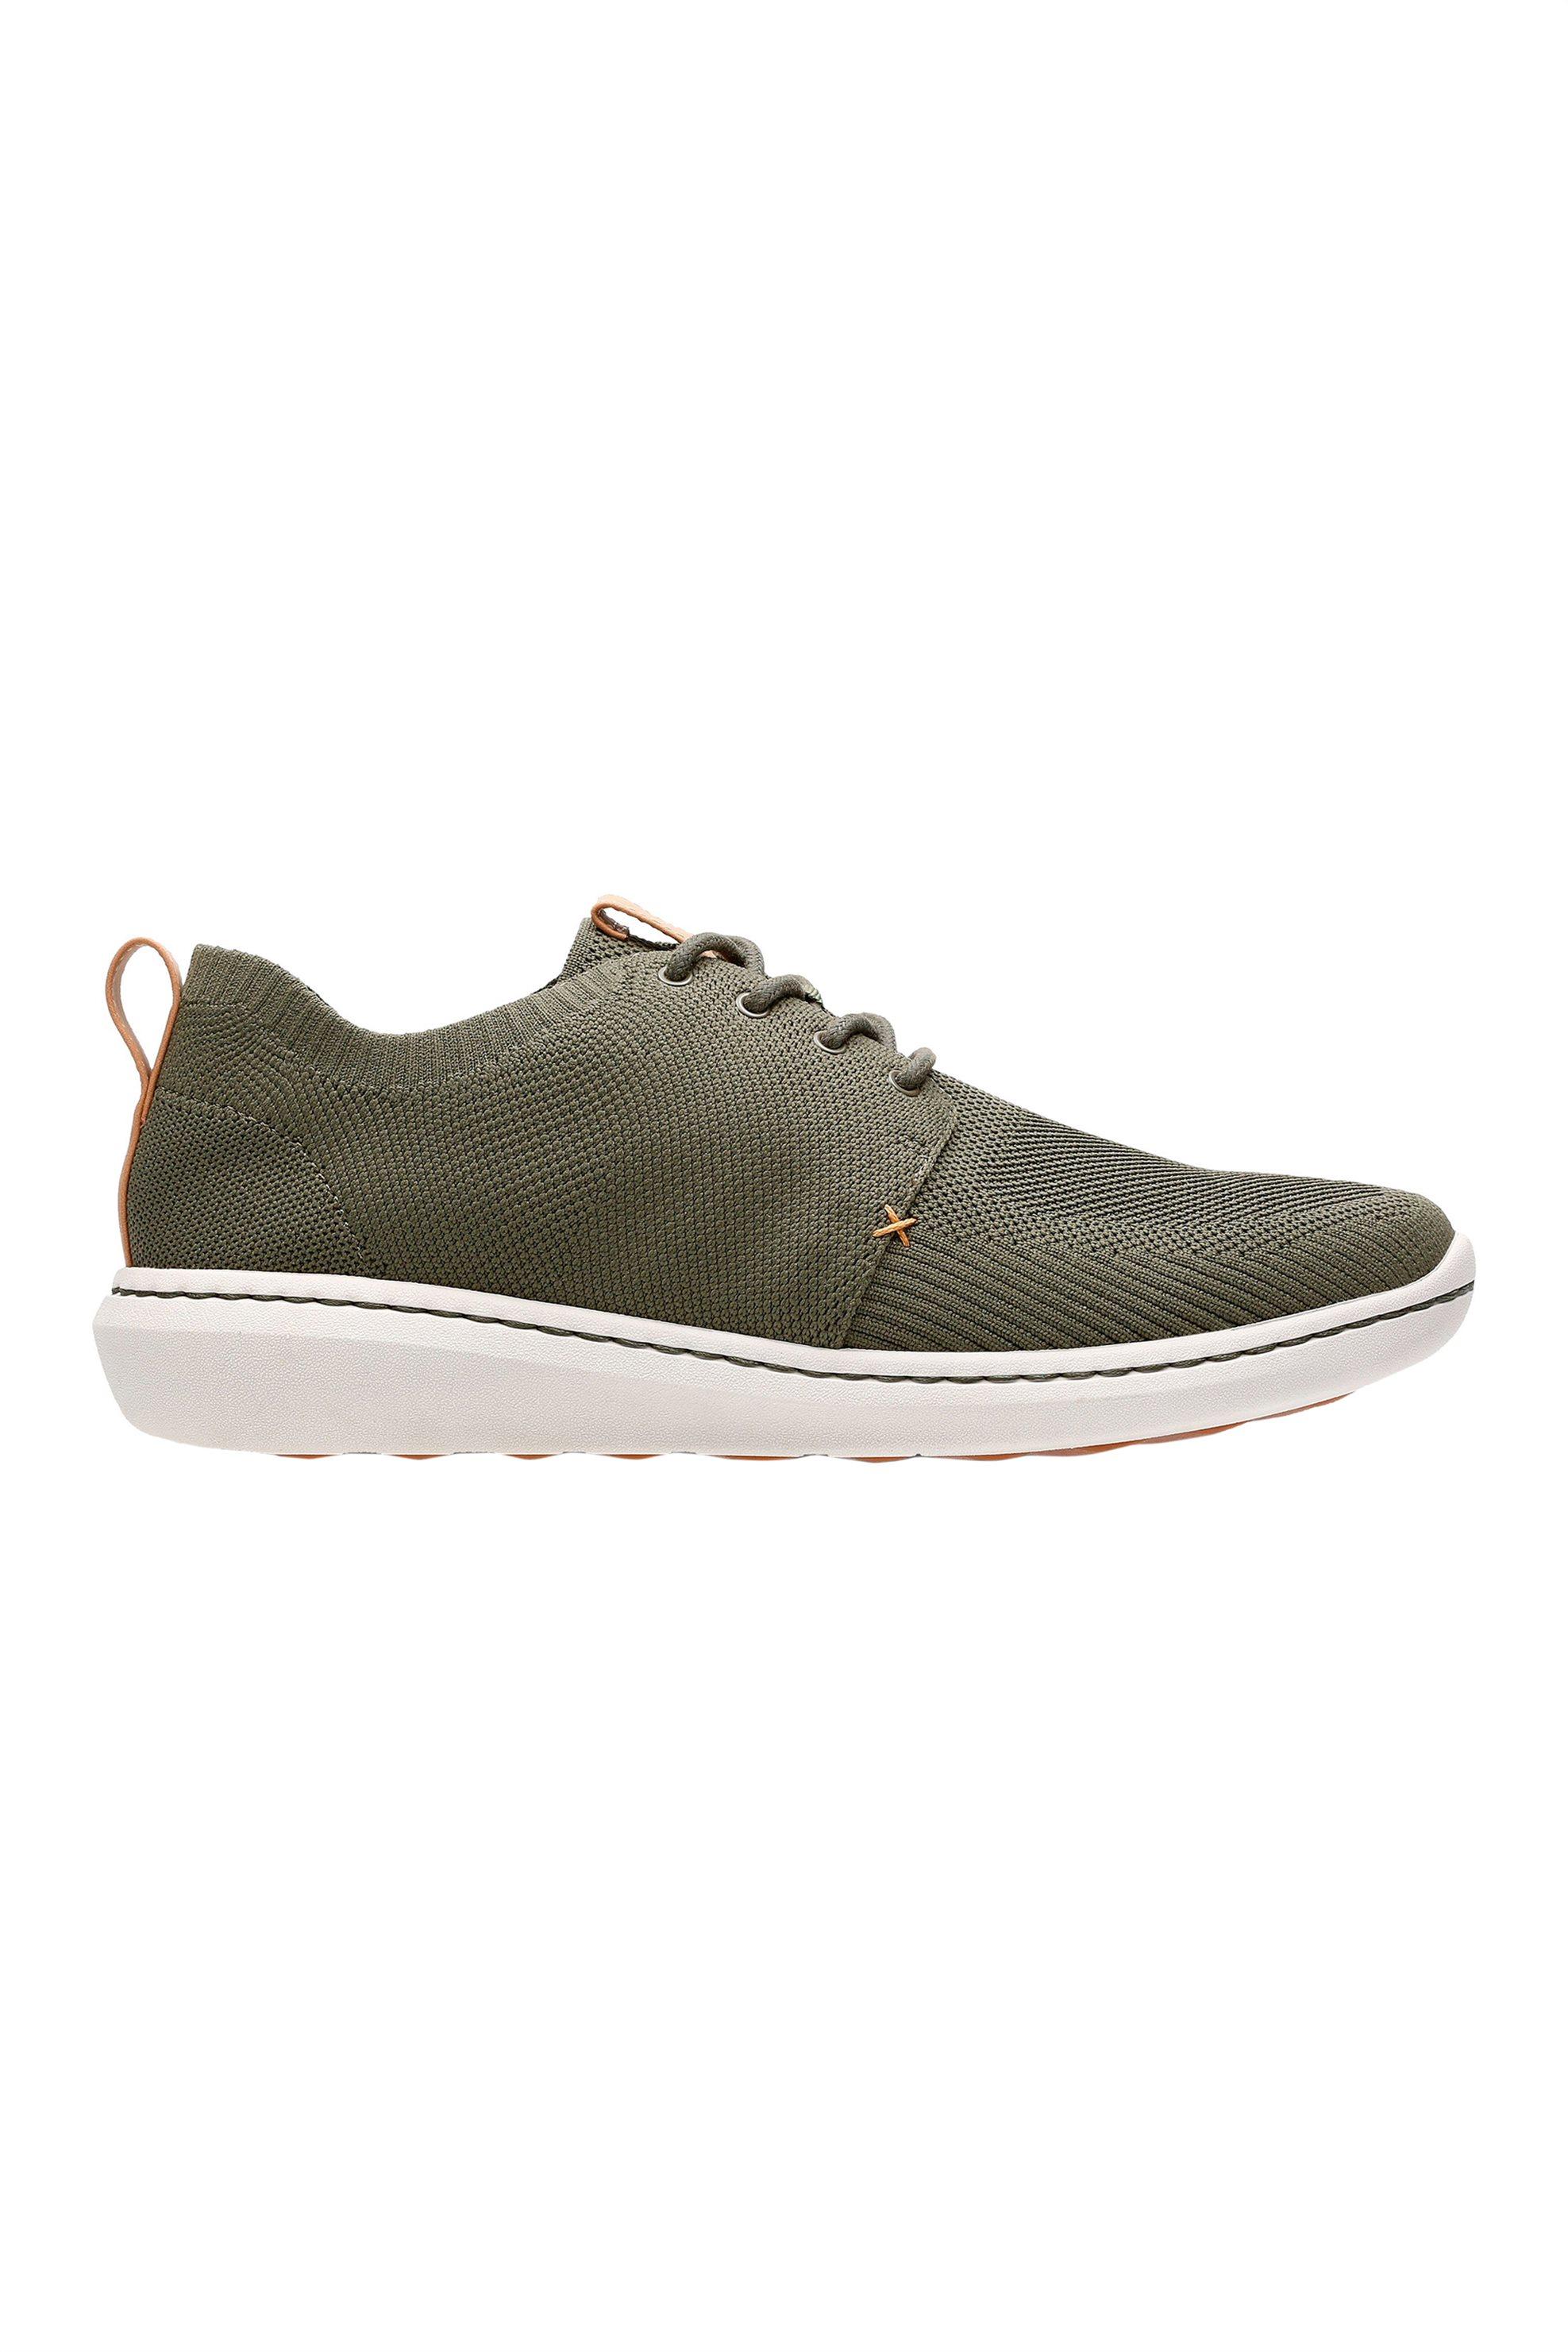 "Clarks ανδρικά sneakers με κορδόνια ""Step Urban Mix"" – 26138174 – Χακί"